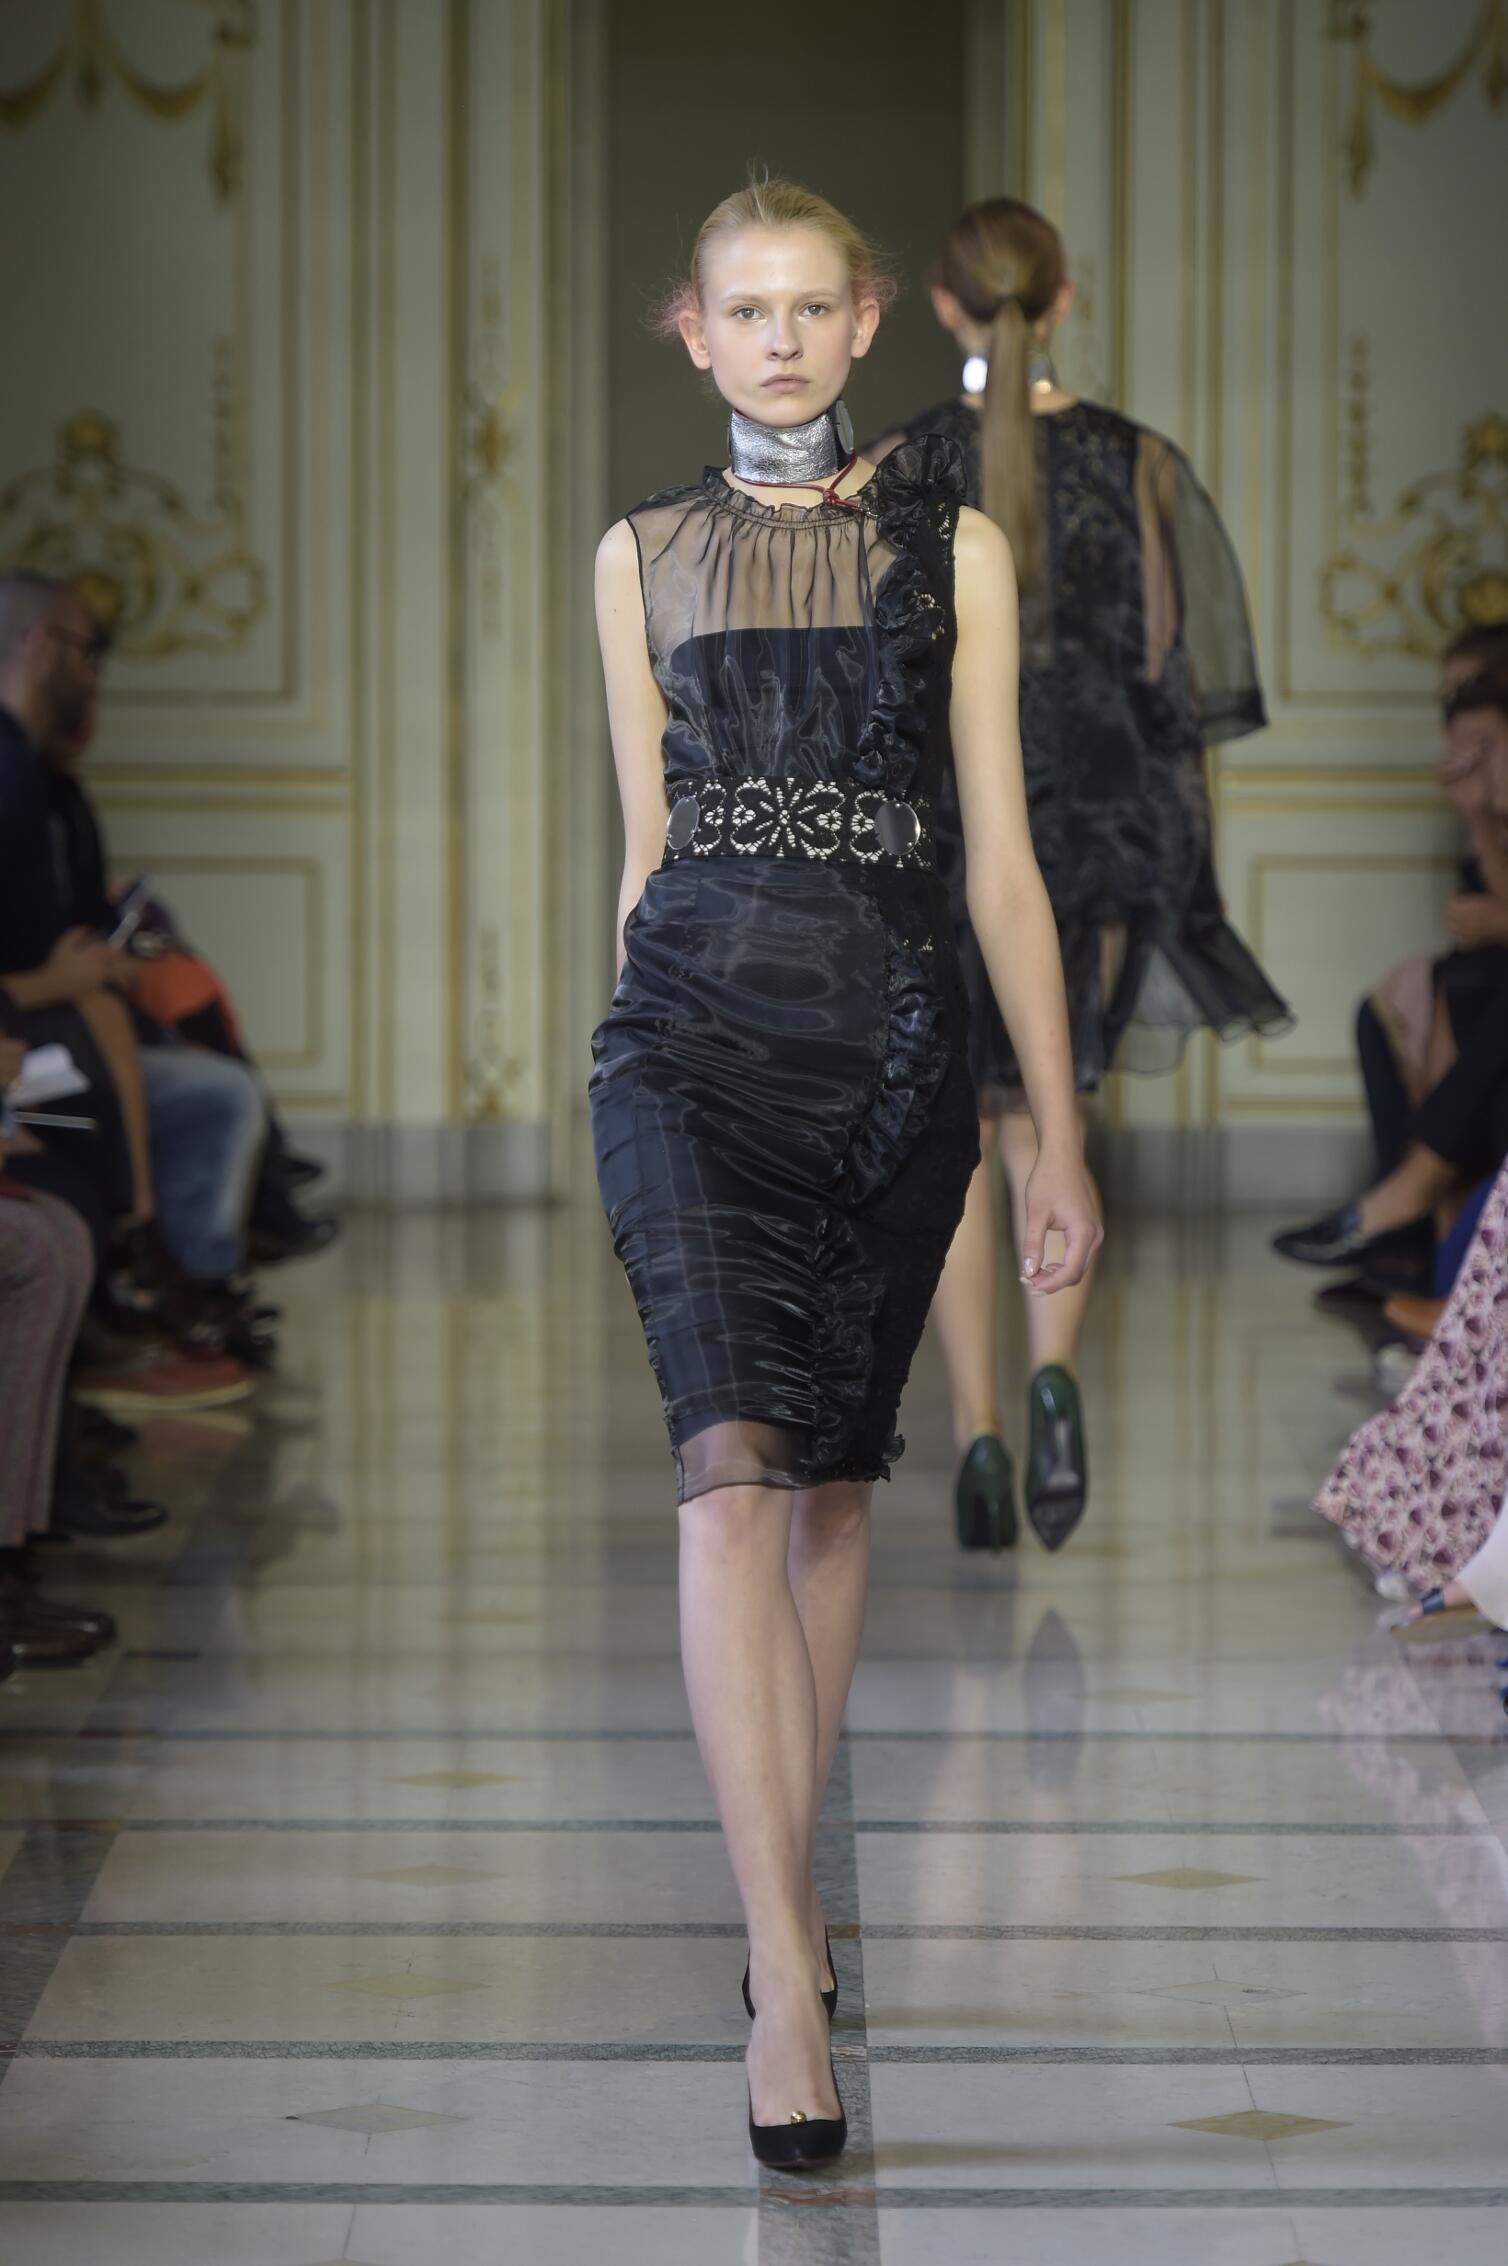 Catwalk Andrea Incontri Woman Fashion Show Summer 2016